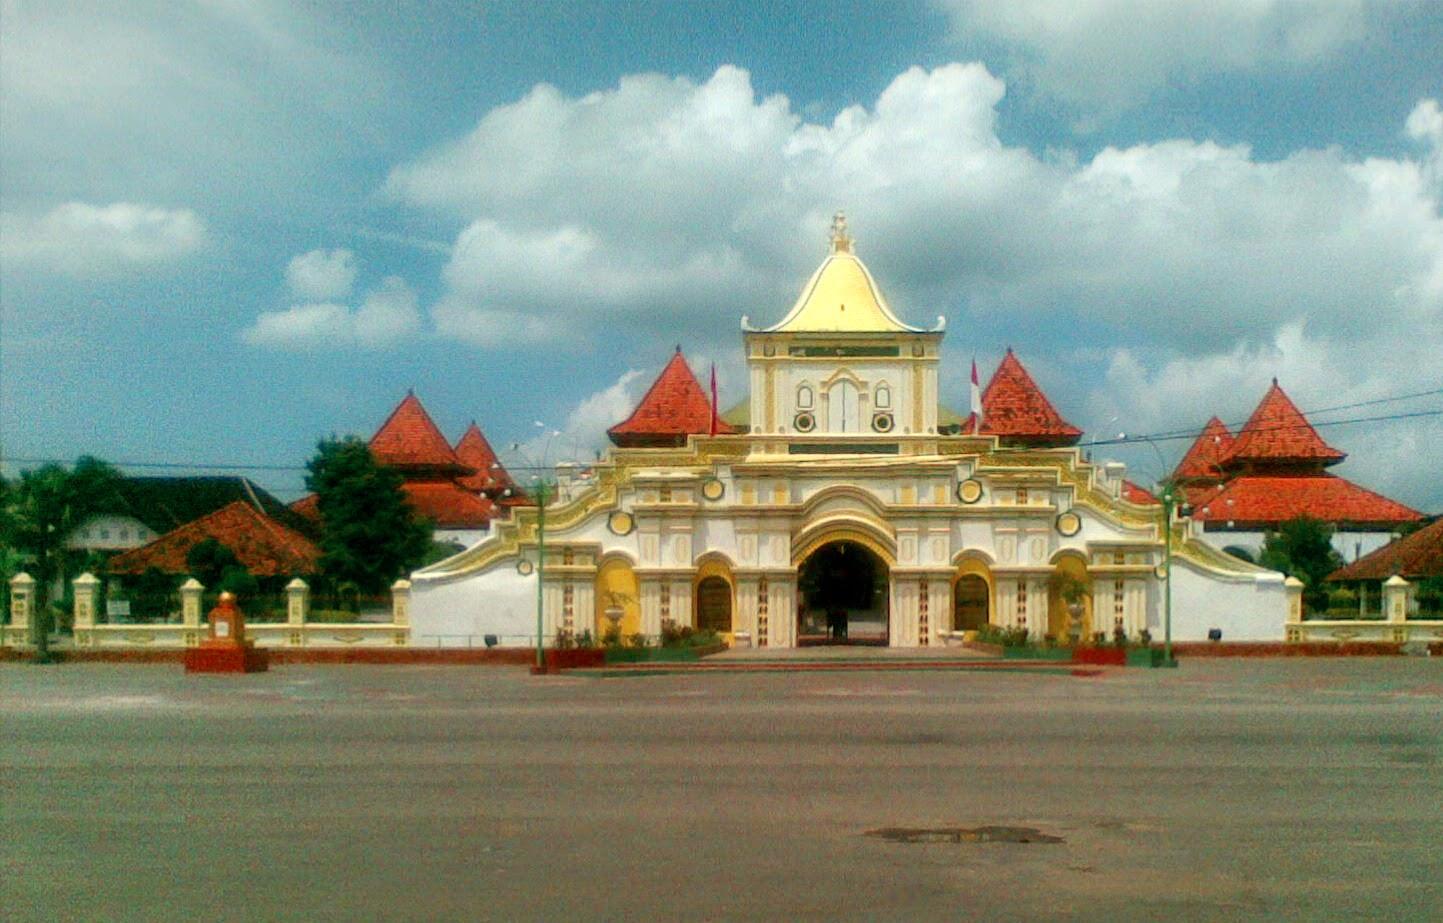 Muslimah Istimewa Taman Adipura Sumenep Masjid Agung Masjud Jami Kota